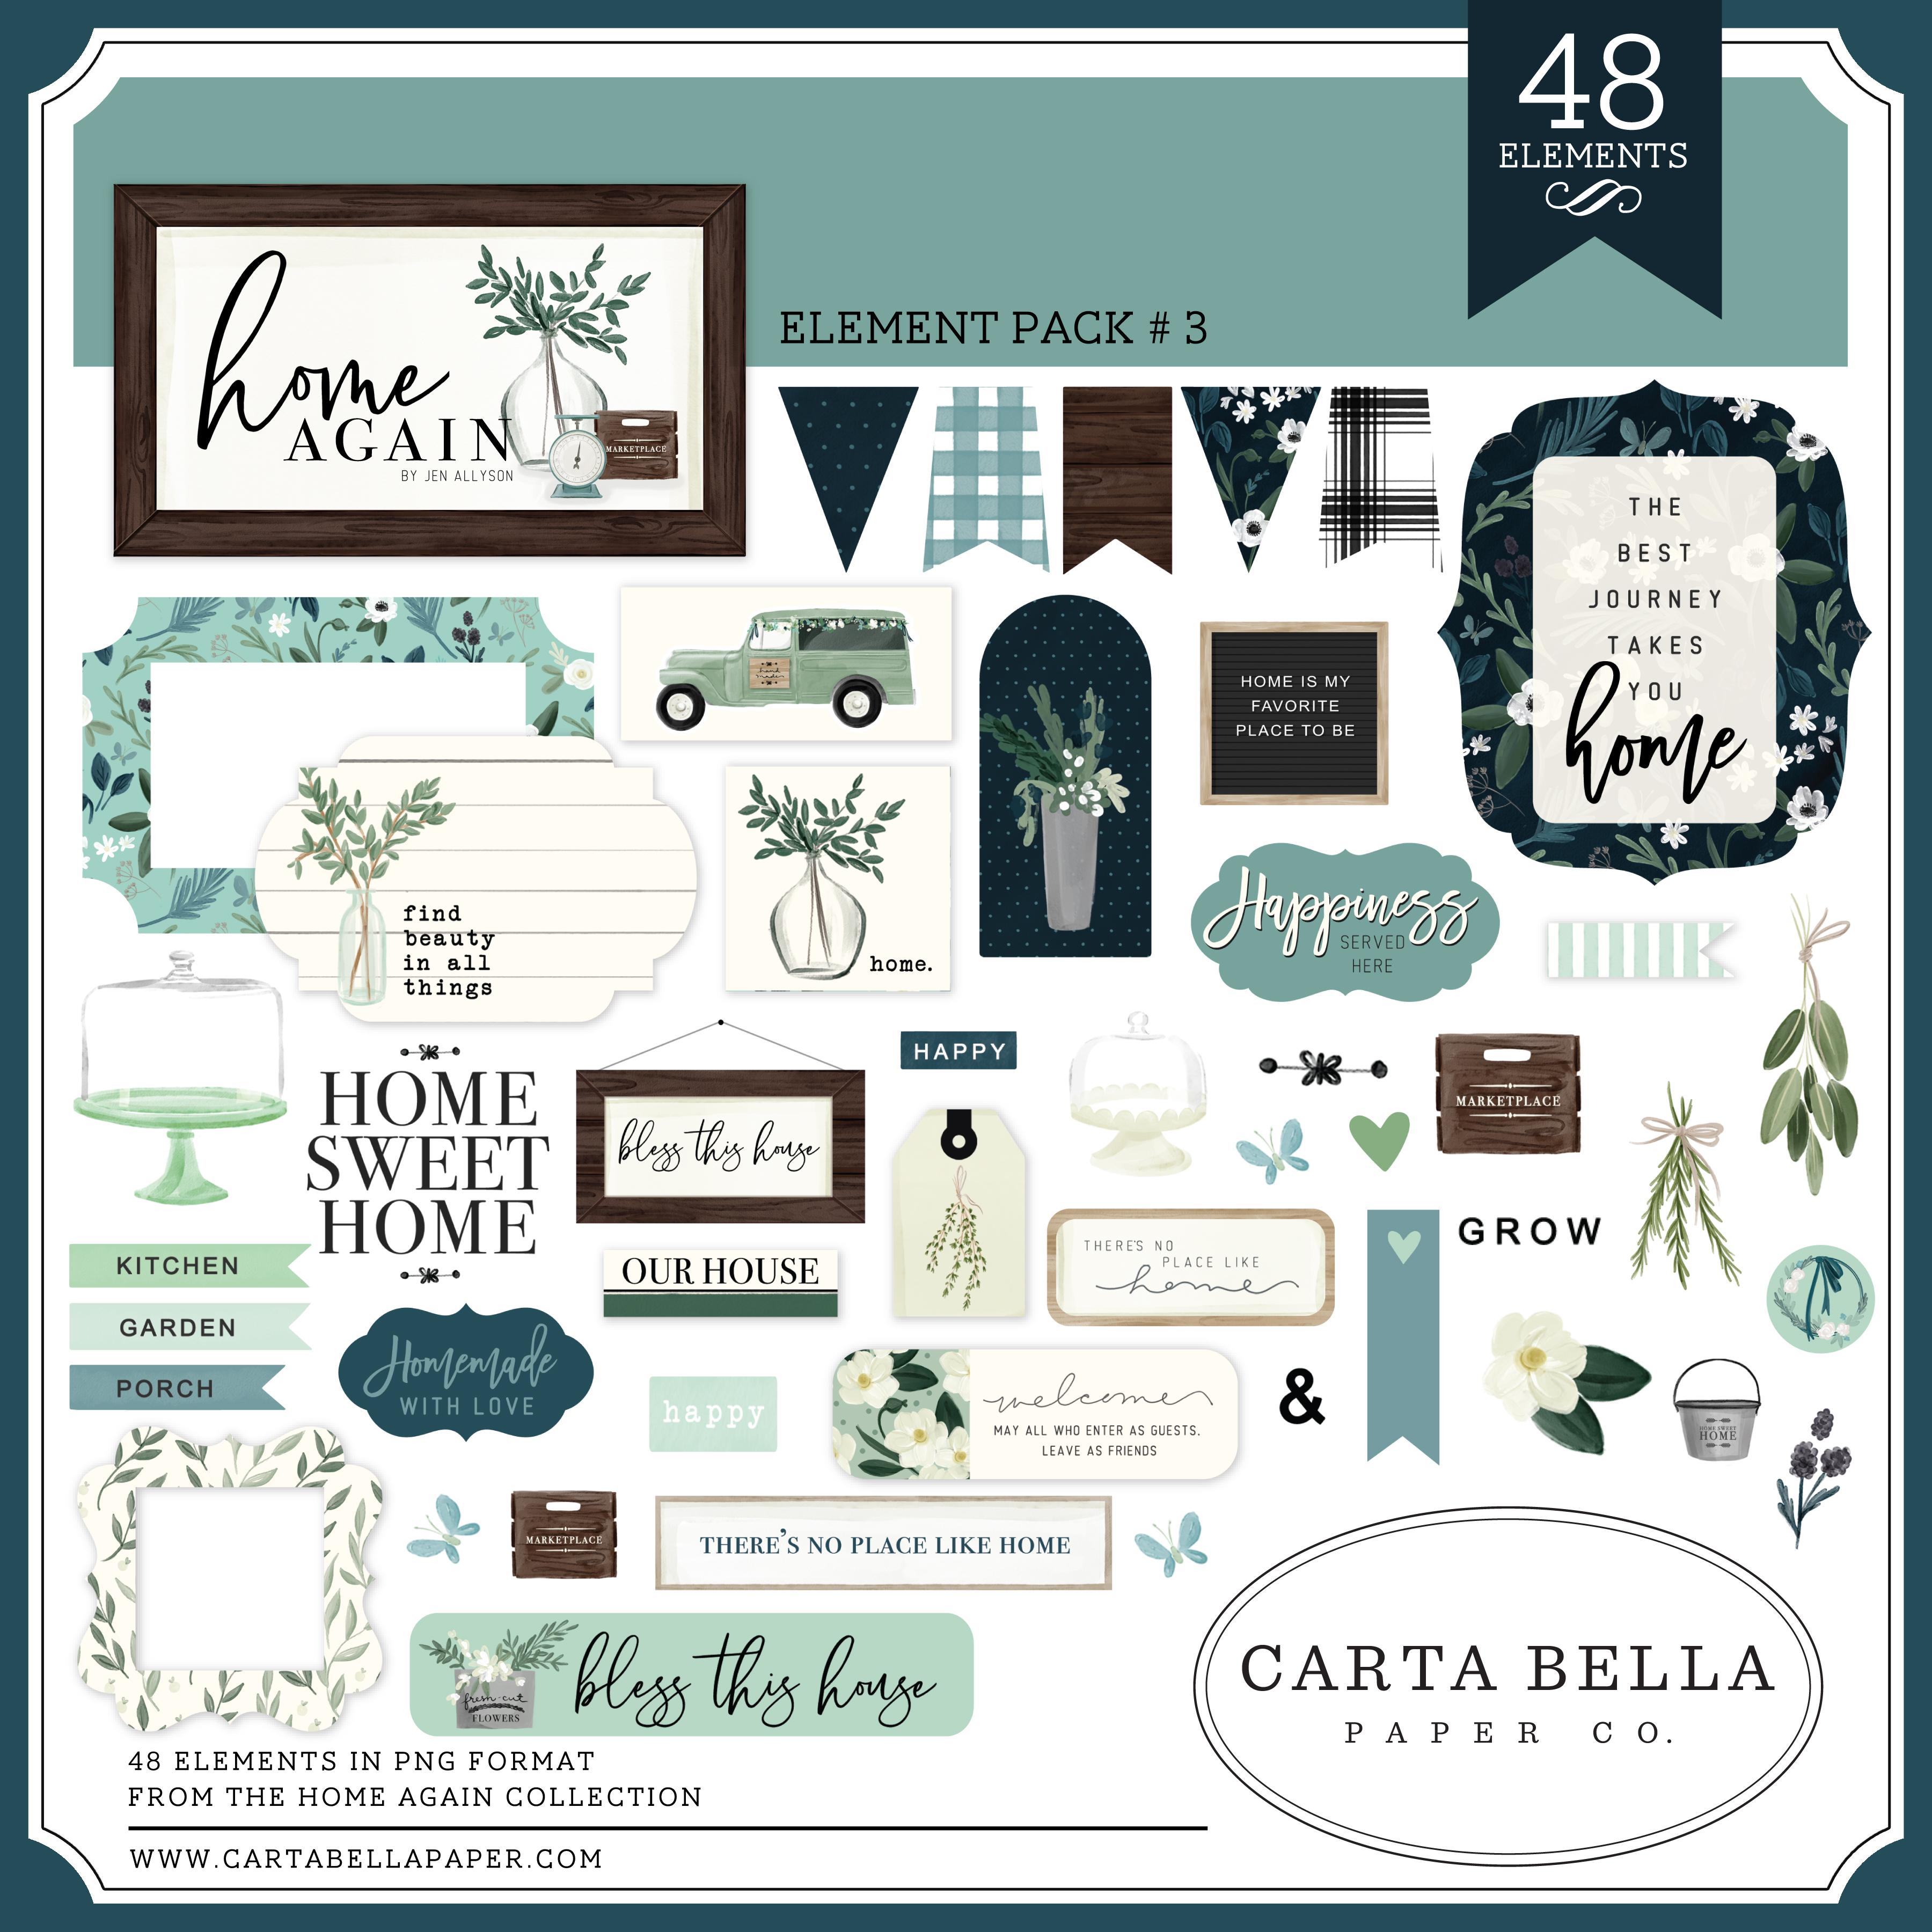 Home Again Element Pack #3